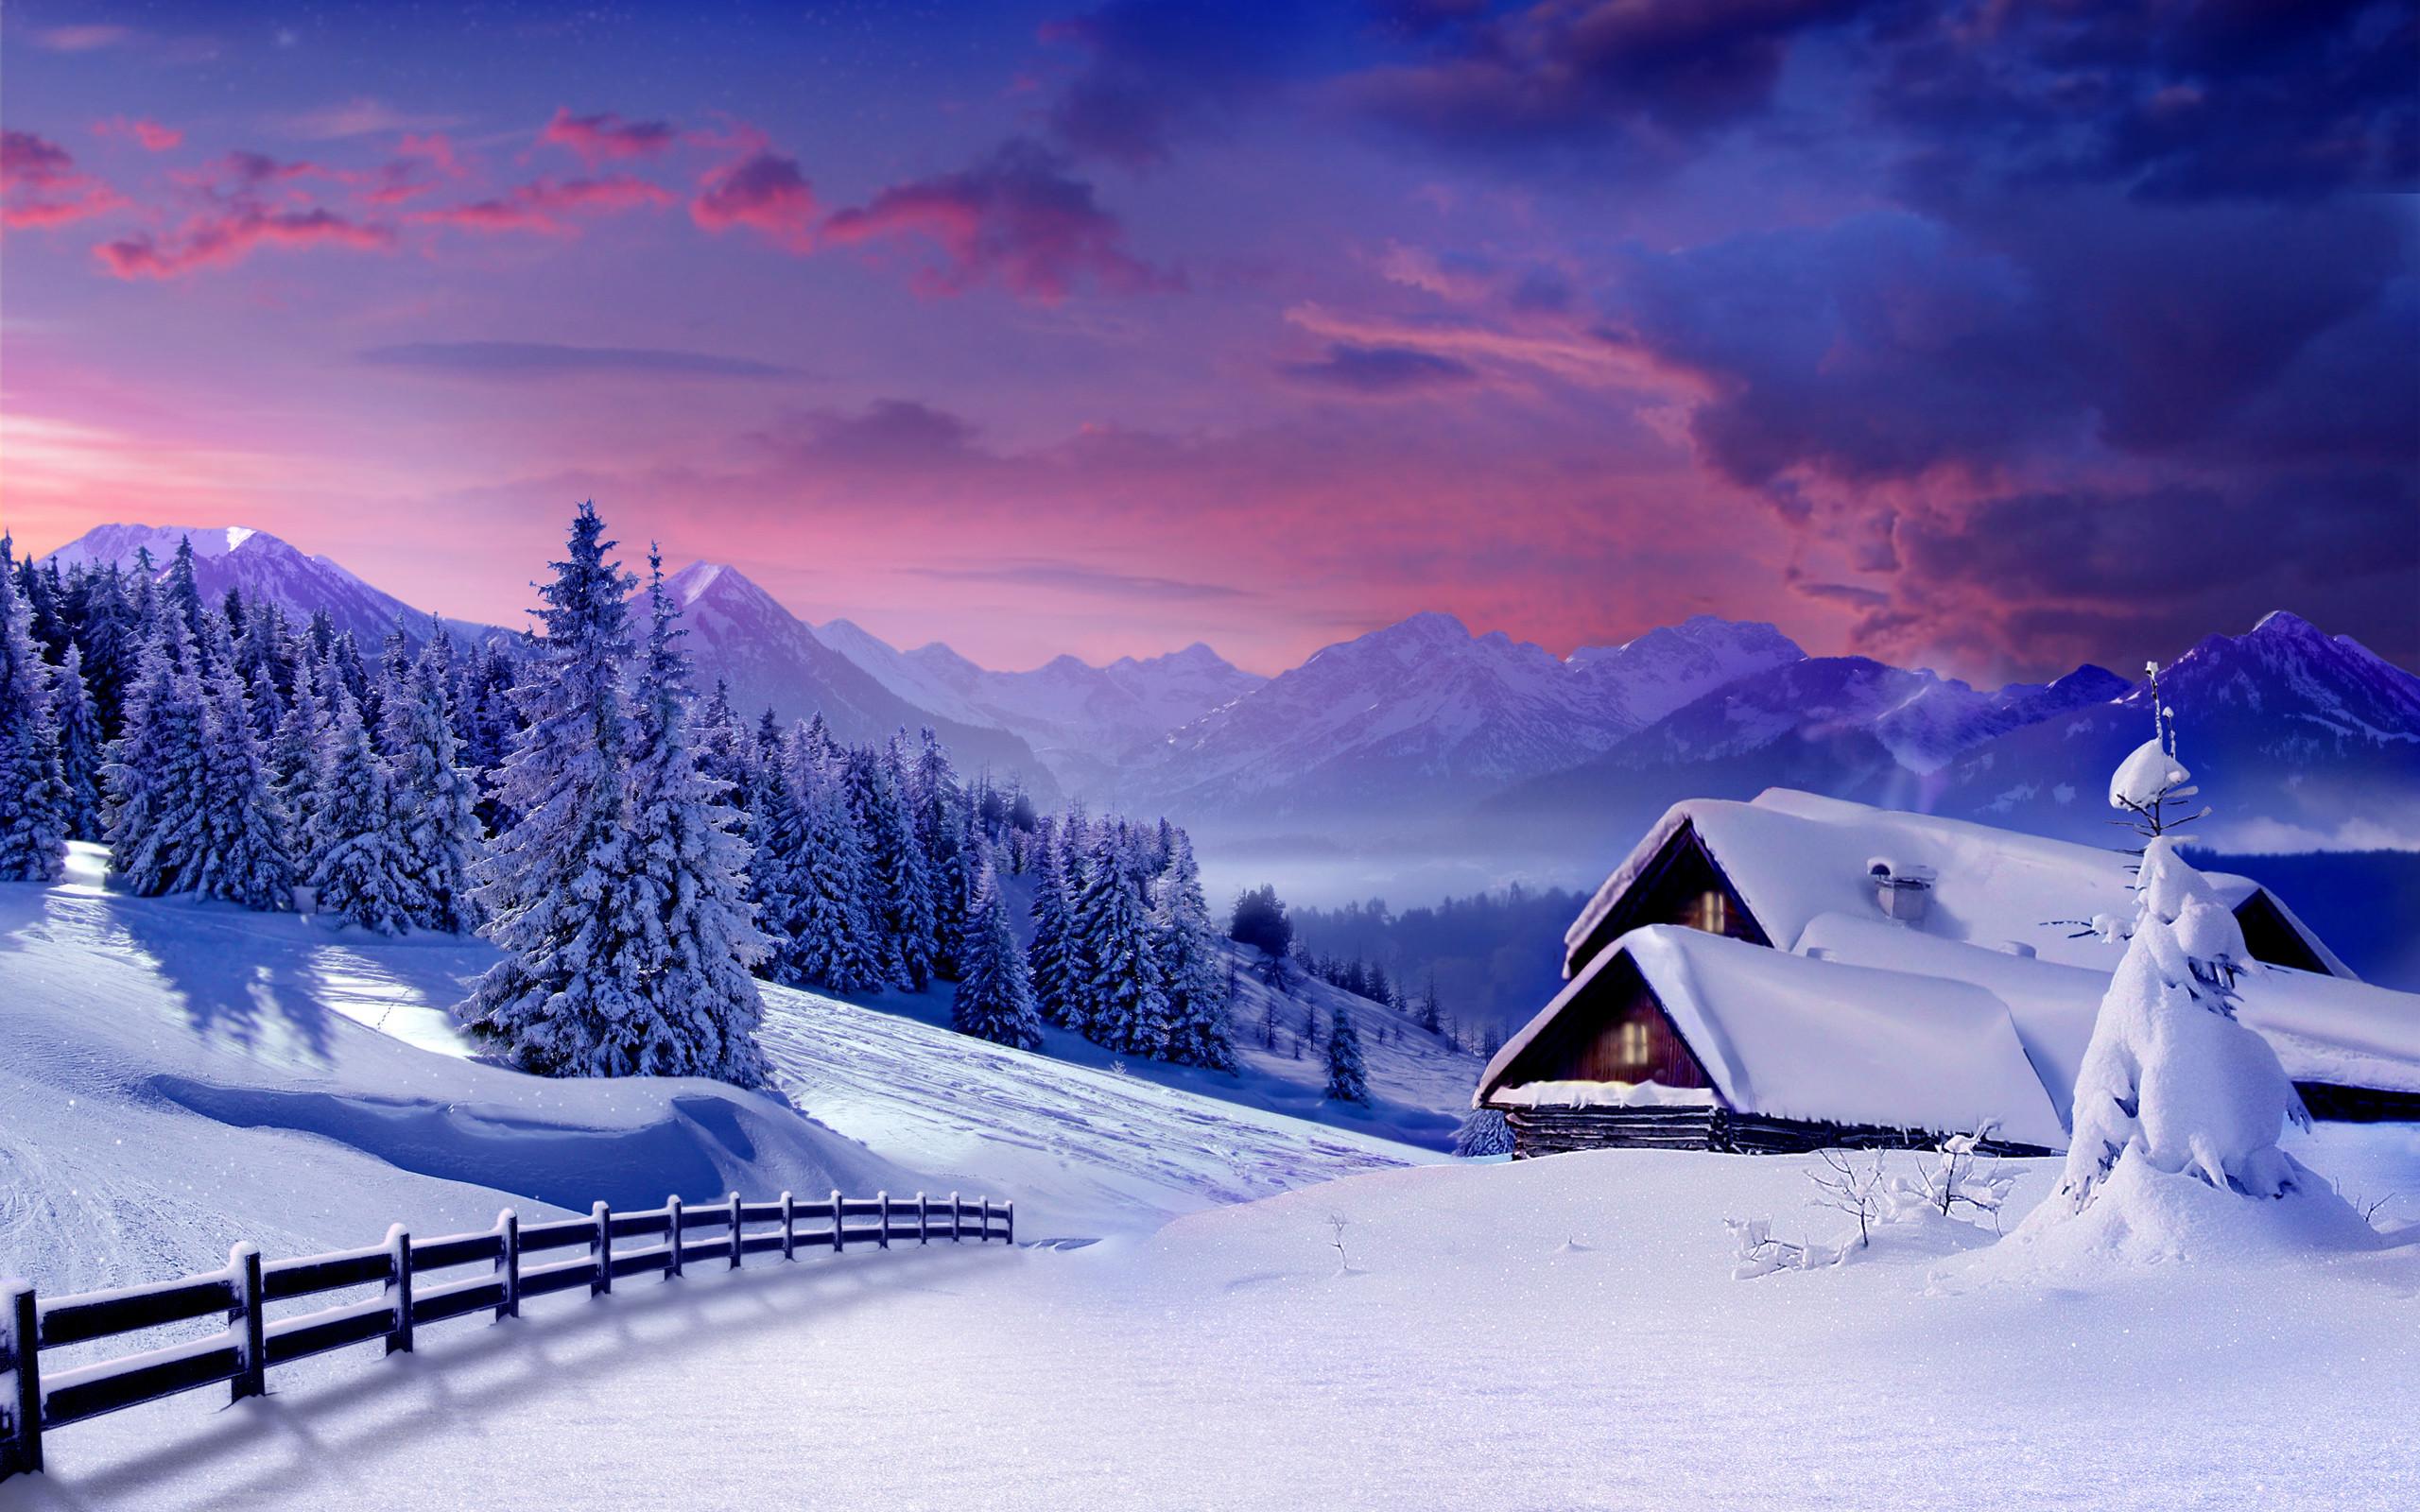 Winter HD Wallpapers | Winter Desktop Wallpapers | Nature Winter .